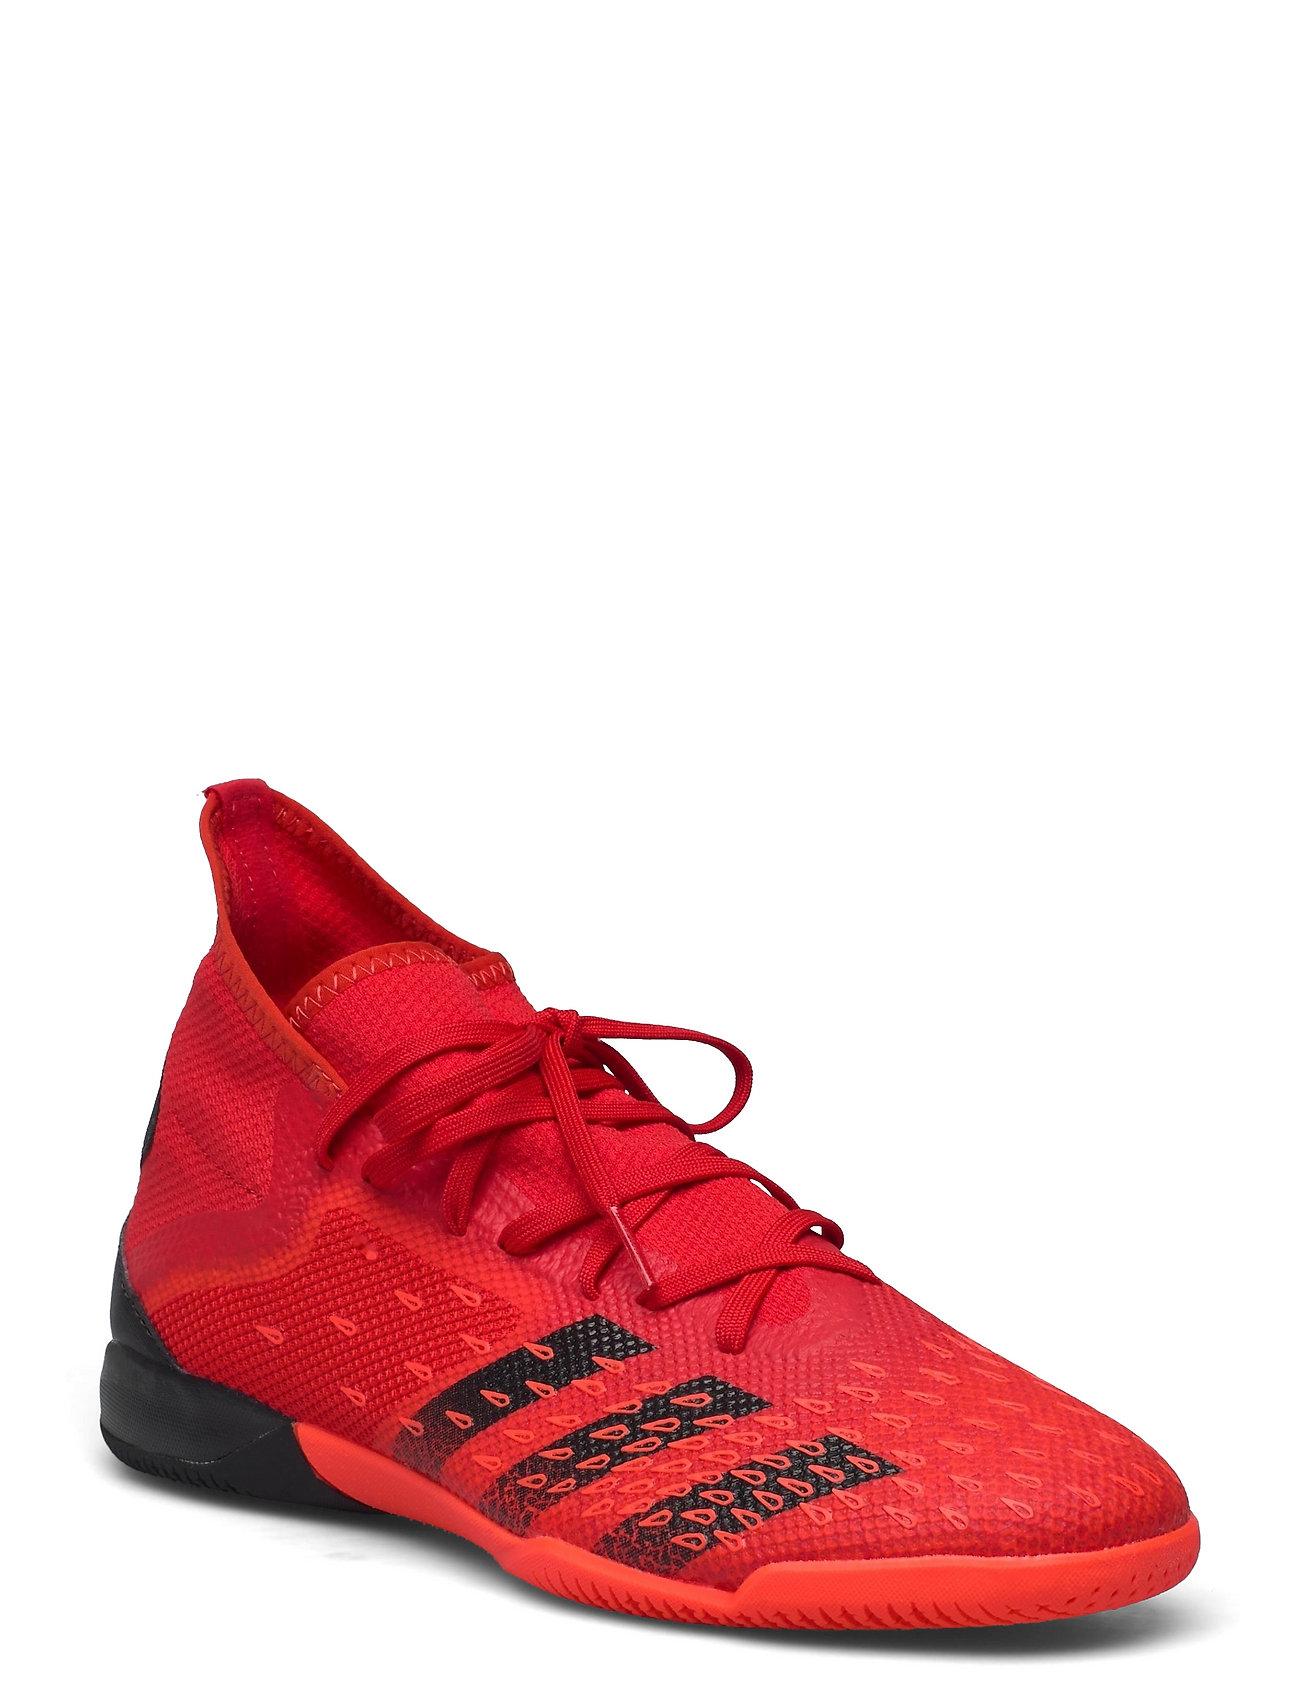 Predator Freak.3 Indoor Boots Q3q4 21 Shoes Sport Shoes Football Boots Rød Adidas Performance